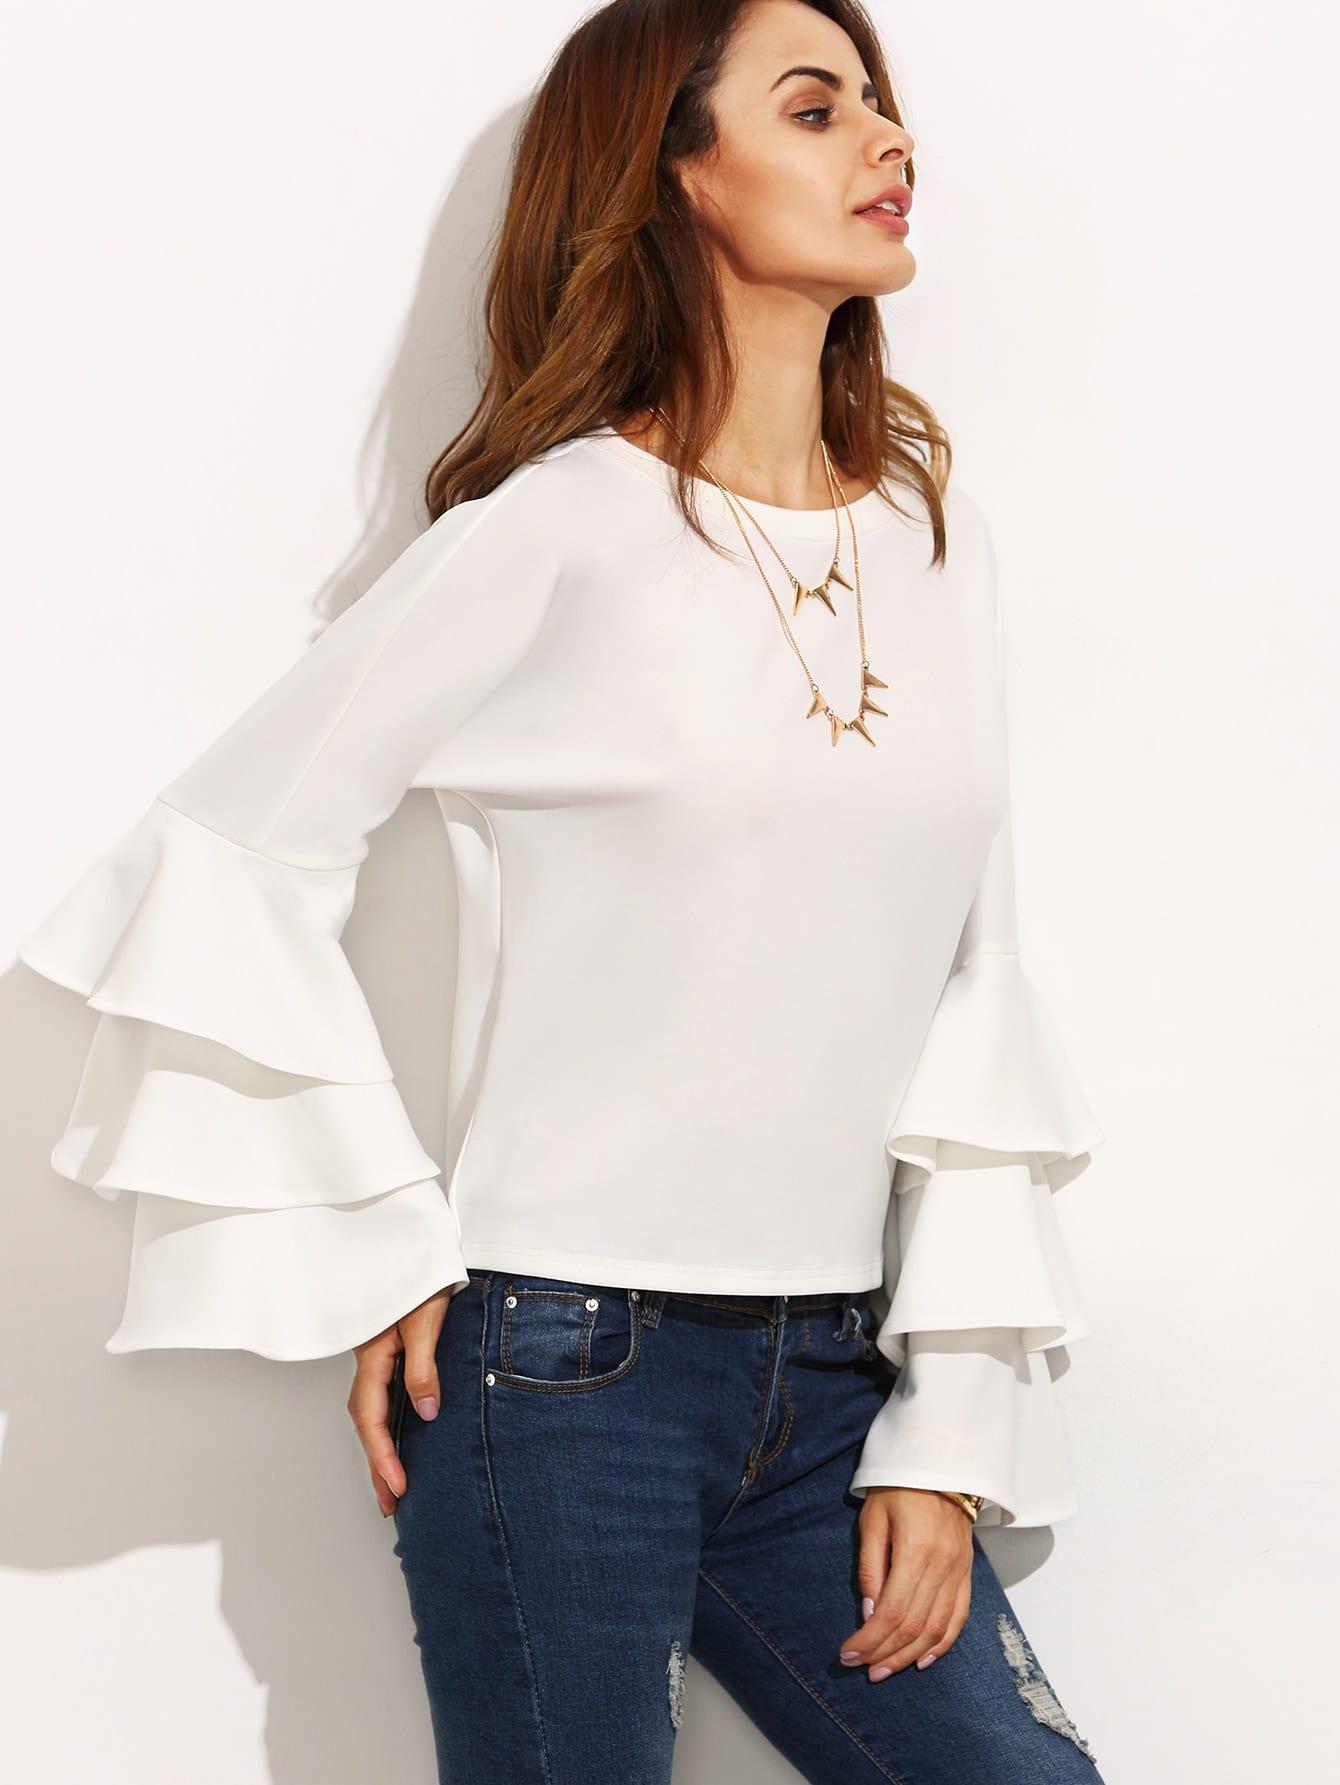 blouse160728721_5